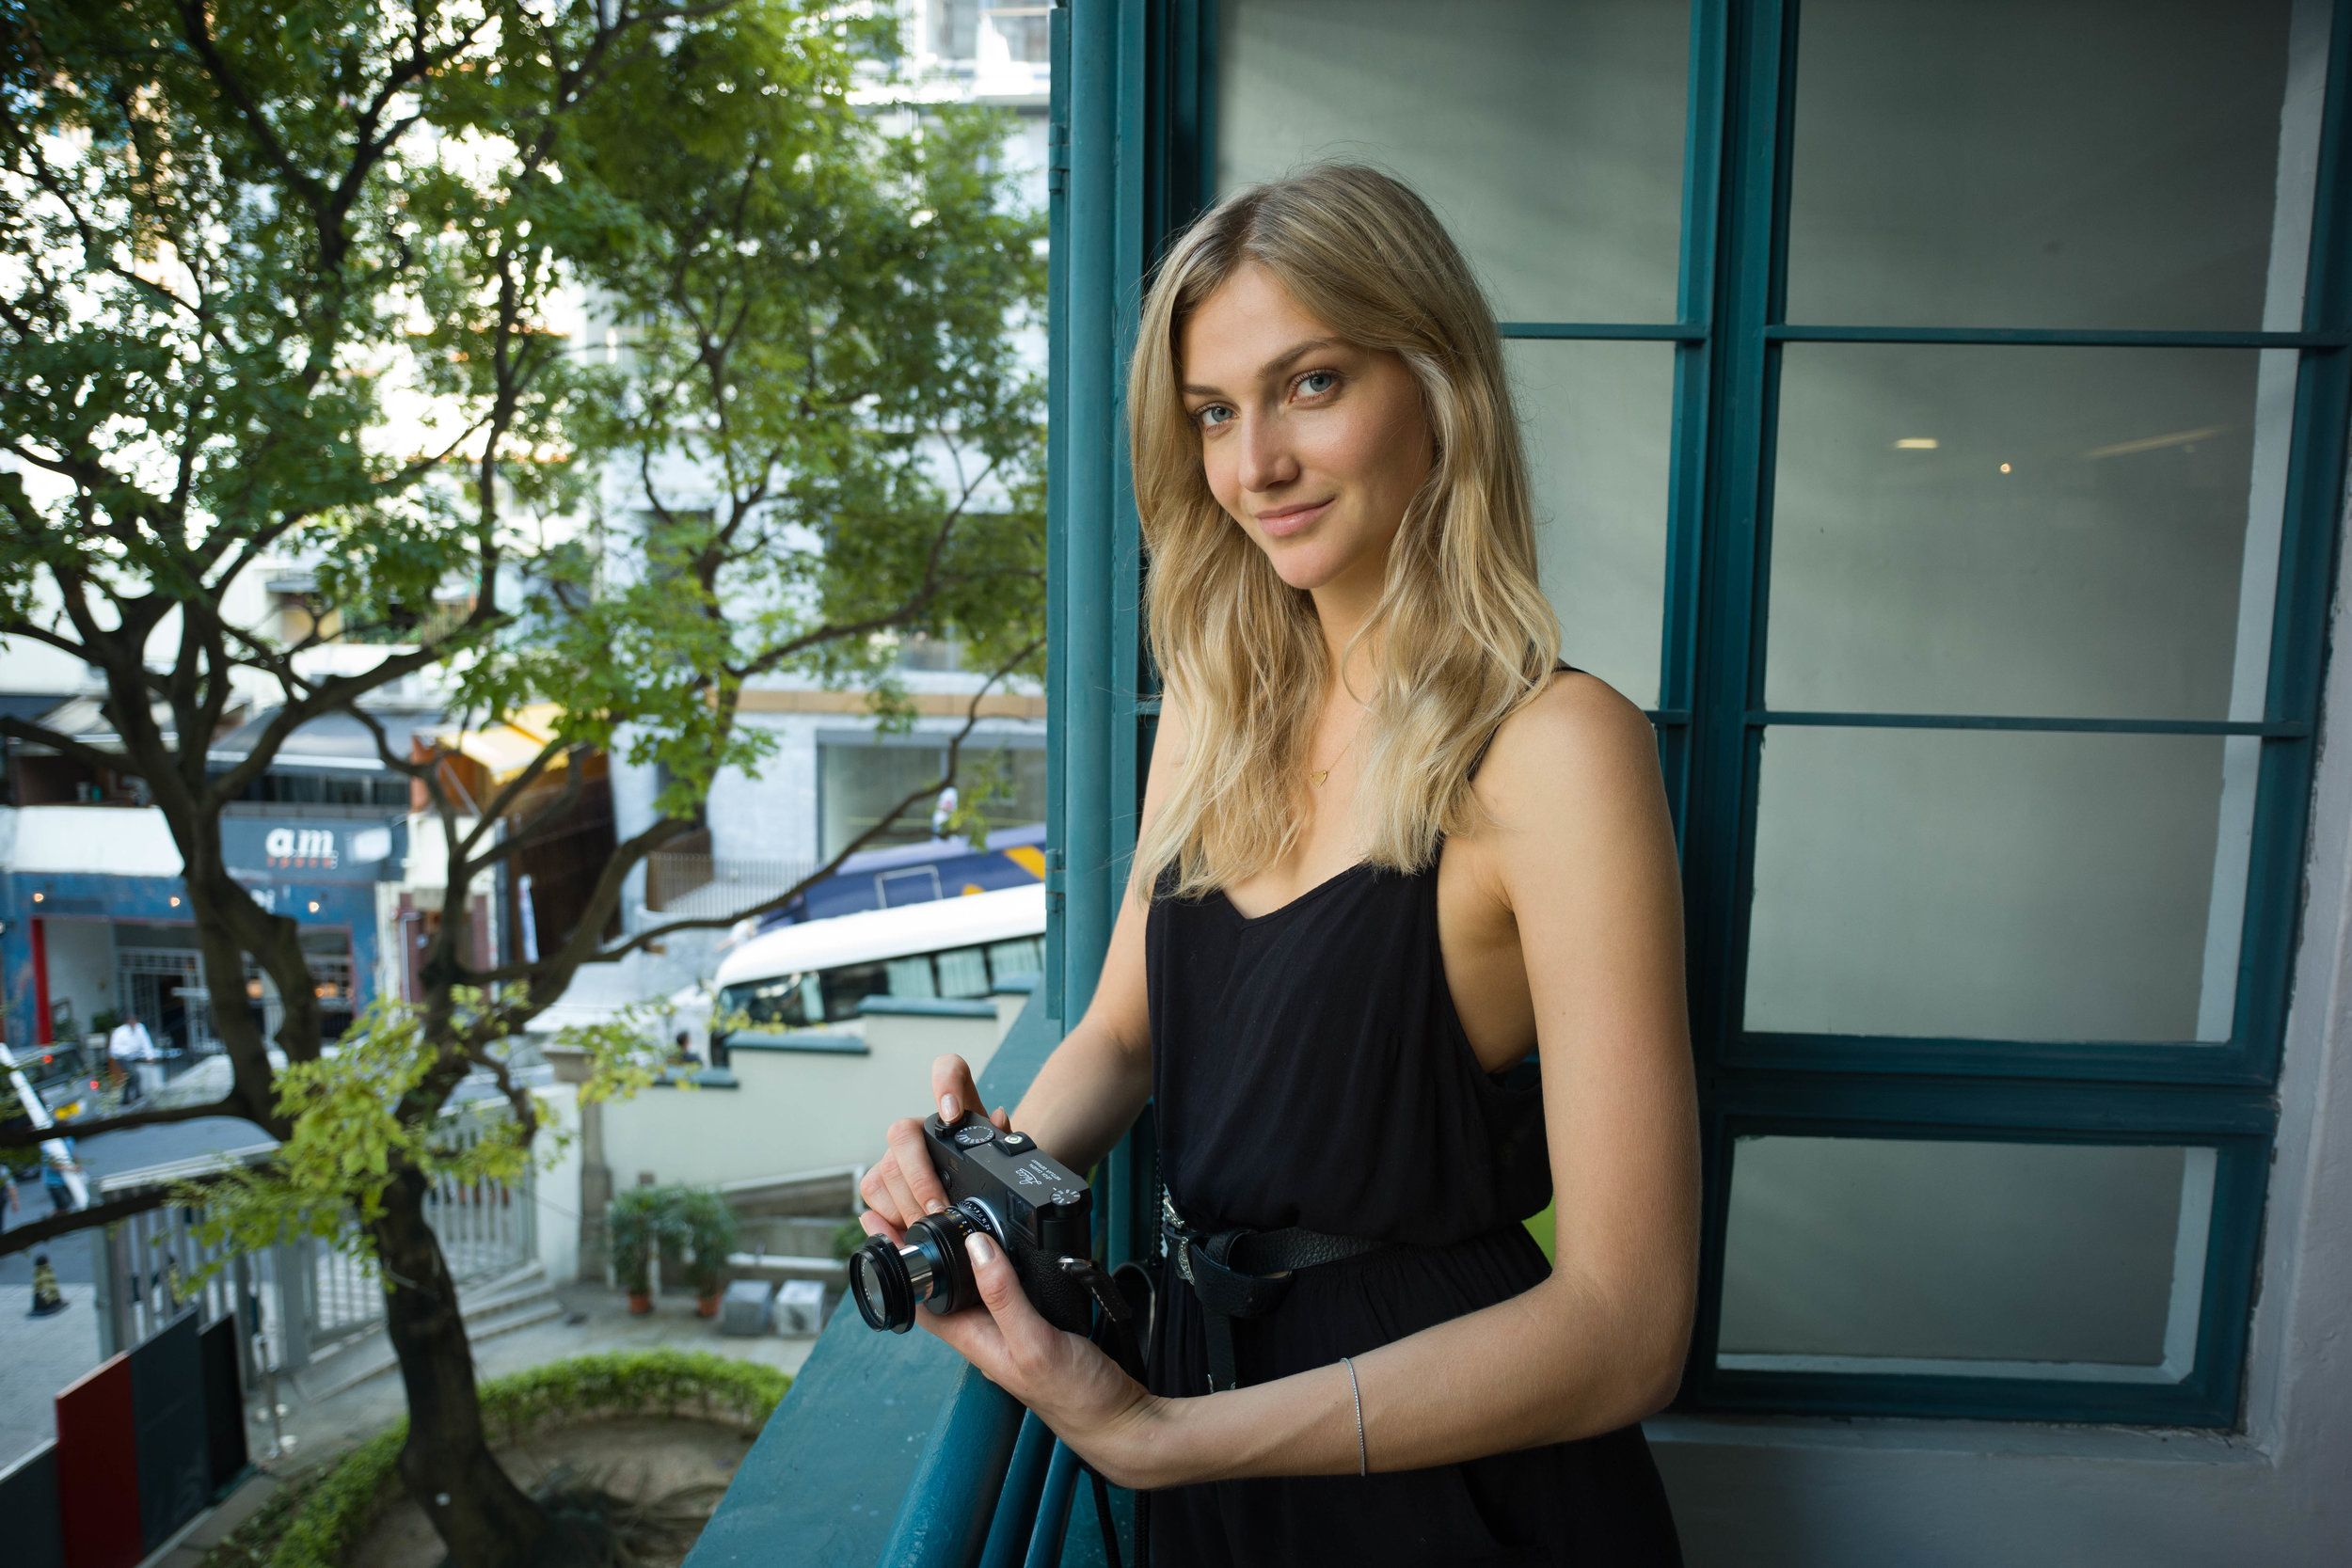 Leica M10 + Leica 50mm f/2.8 Elmar-M - ISO 800, 1/125s, f/4- Similar framing